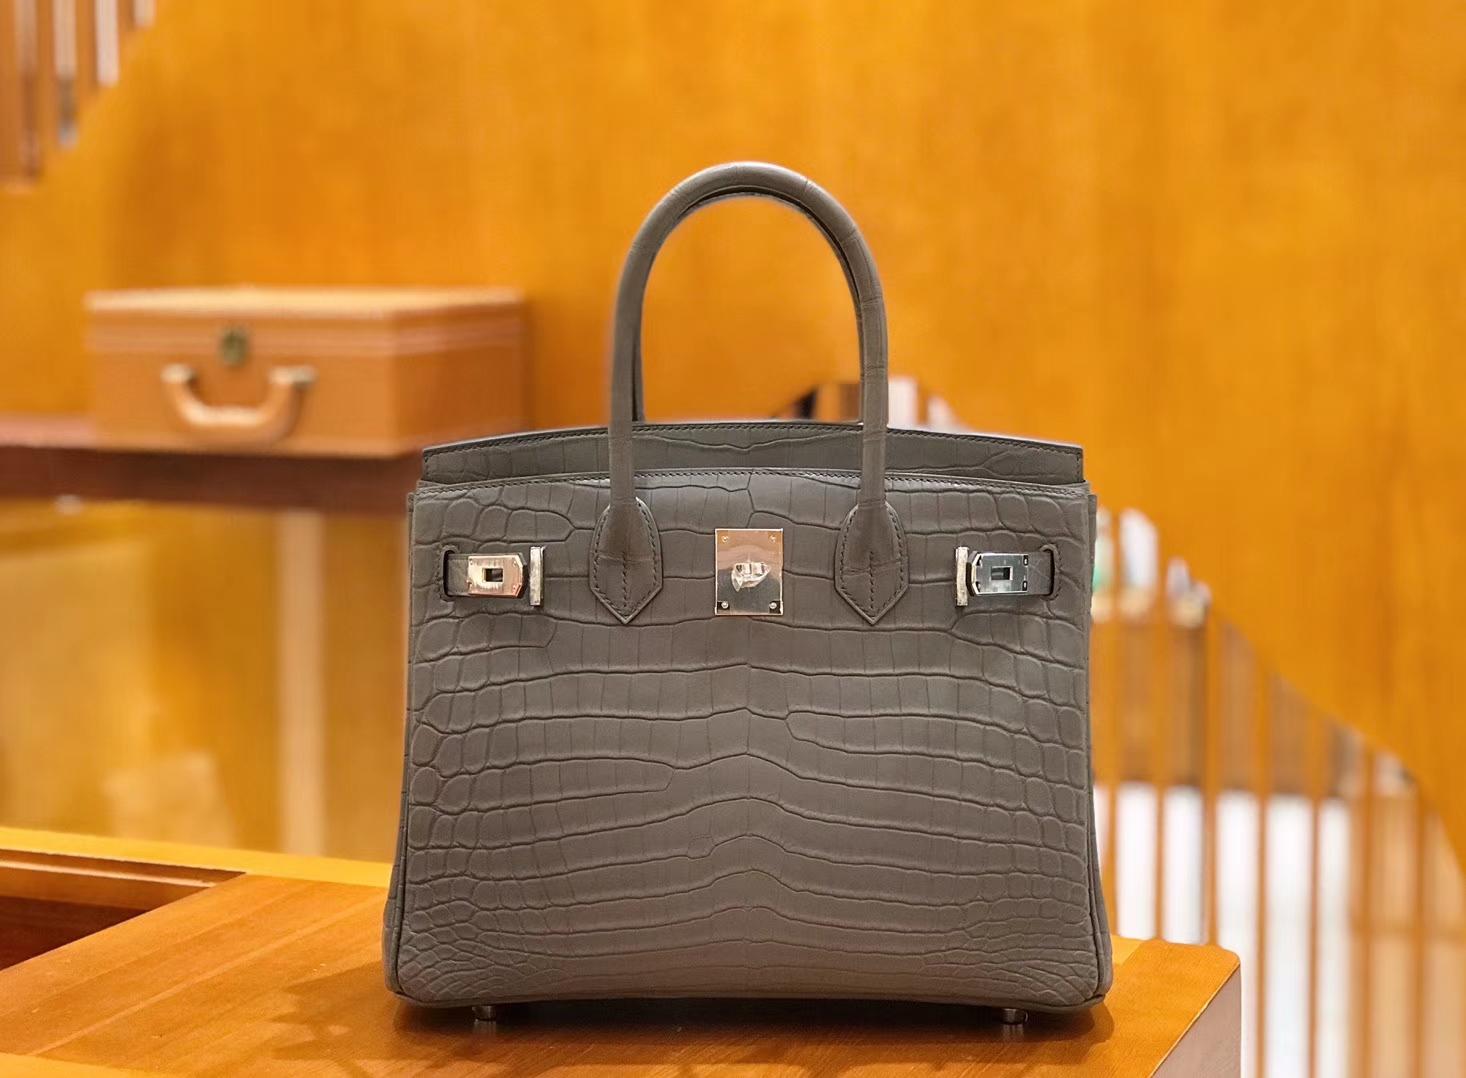 Hermès(爱马仕)Birkin 铂金包 尼罗鳄鱼皮 锡器灰 30cm